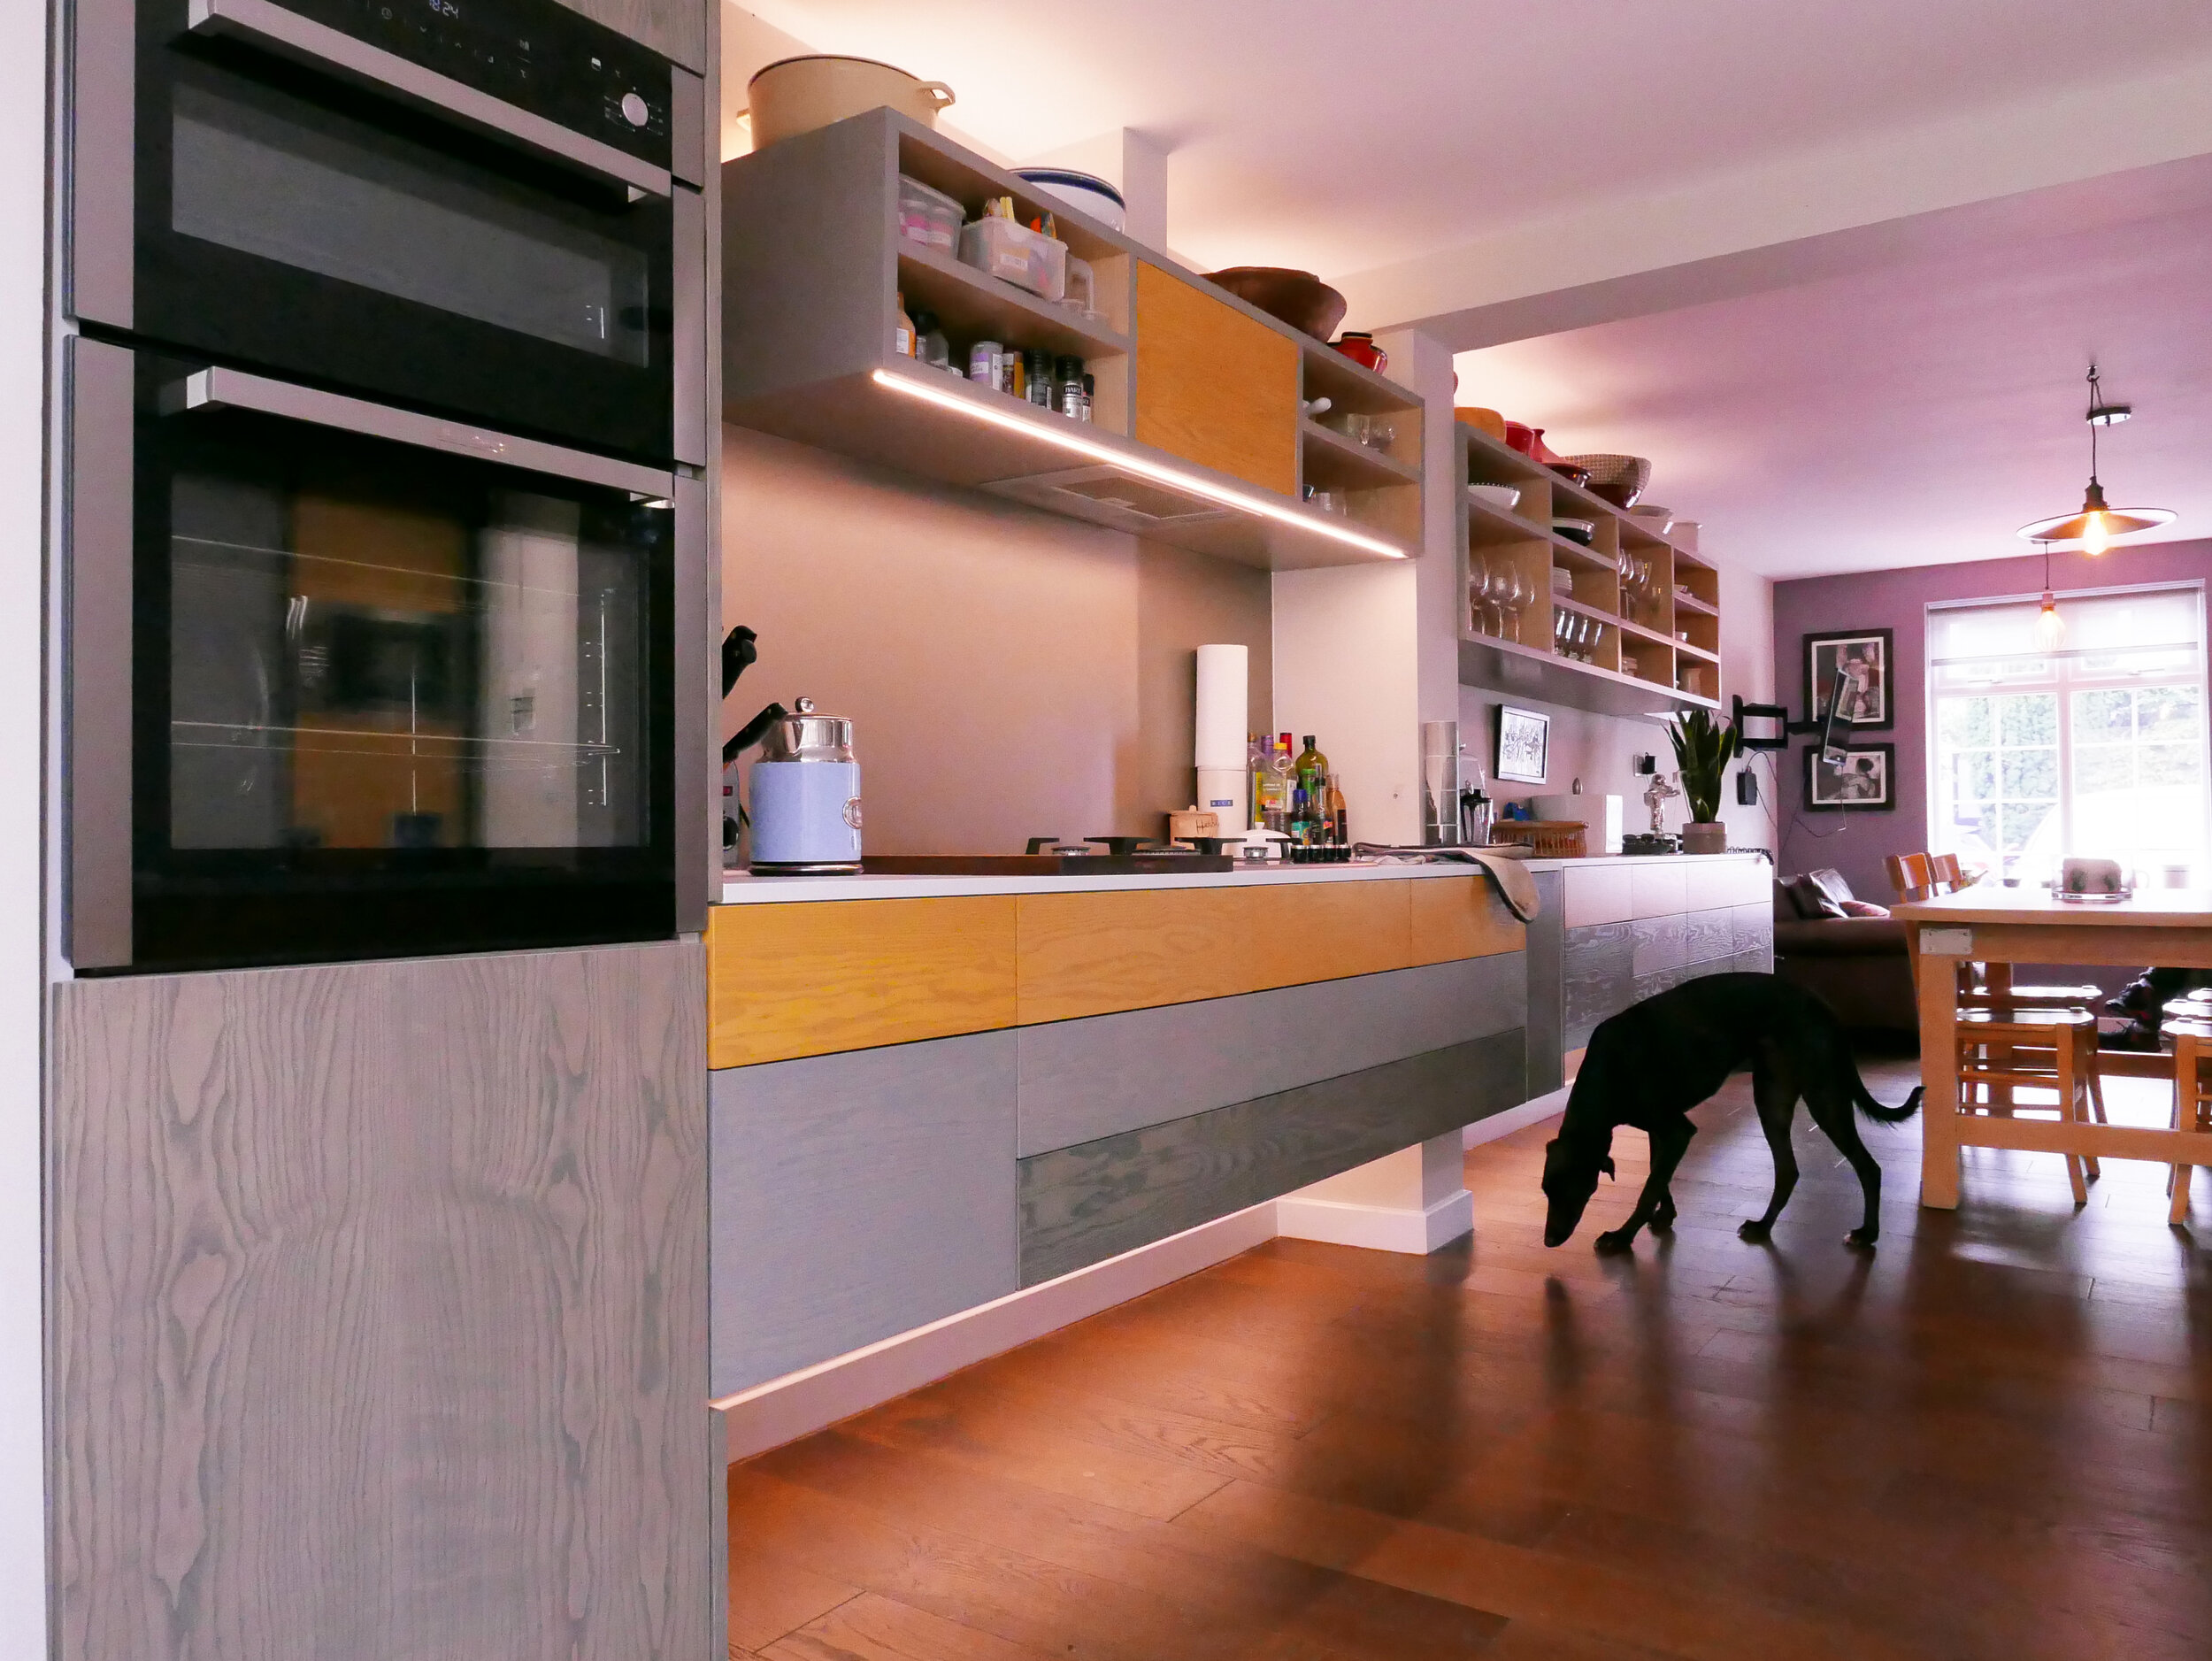 Bespoke Kitchen Design Open Plan Living Strip Lights Touch Sensor Operated